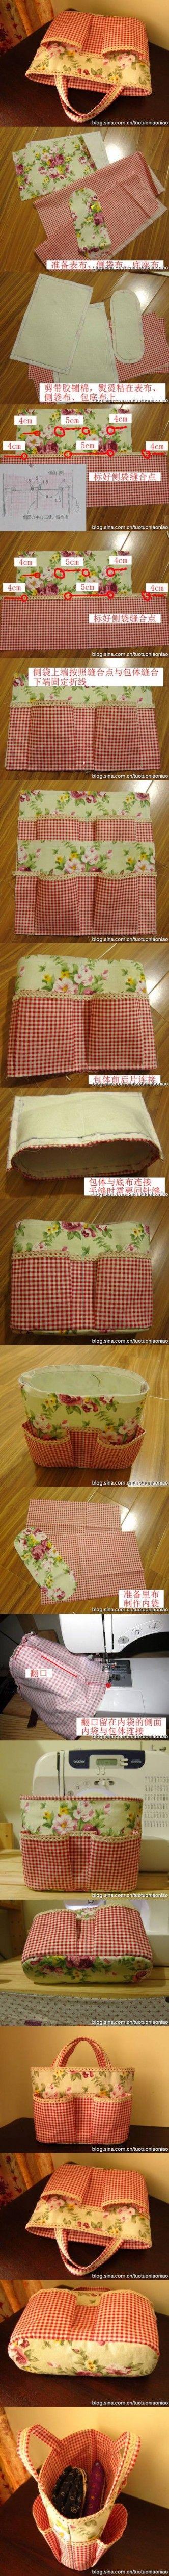 DIY Shop Bags DIY Projects